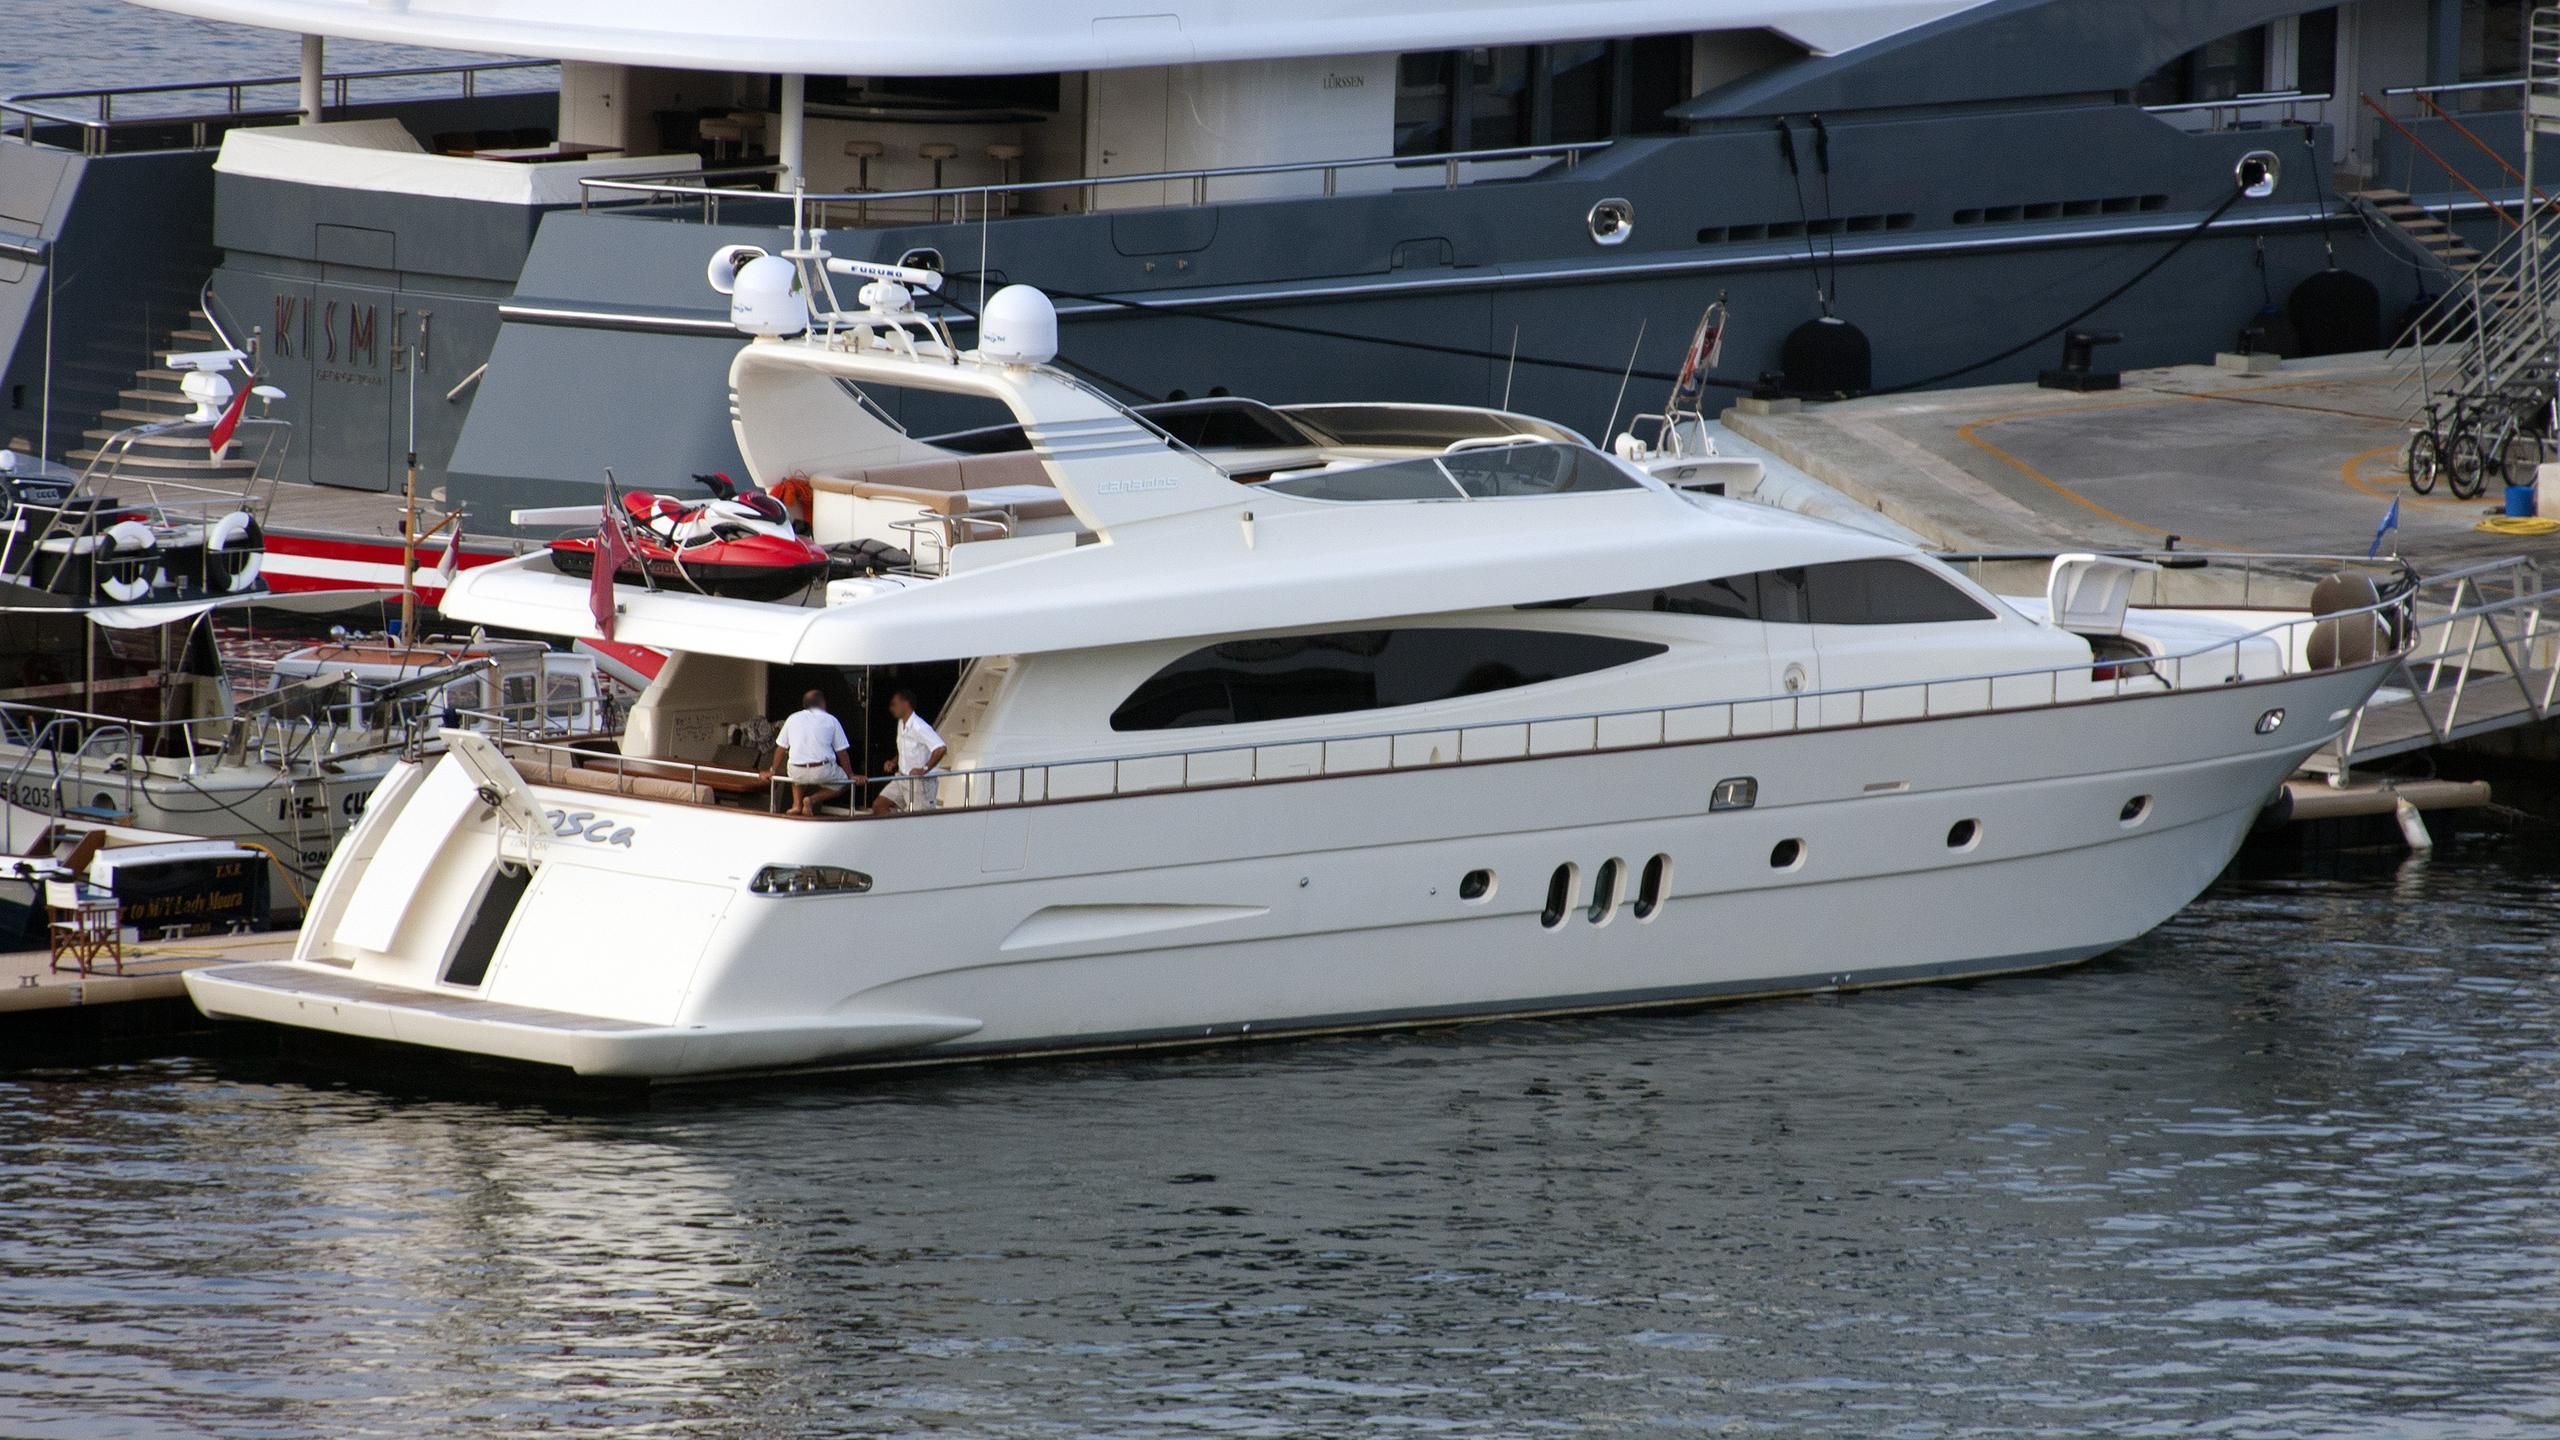 mosca-motor-yacht-canados-86-2007-26m-profile